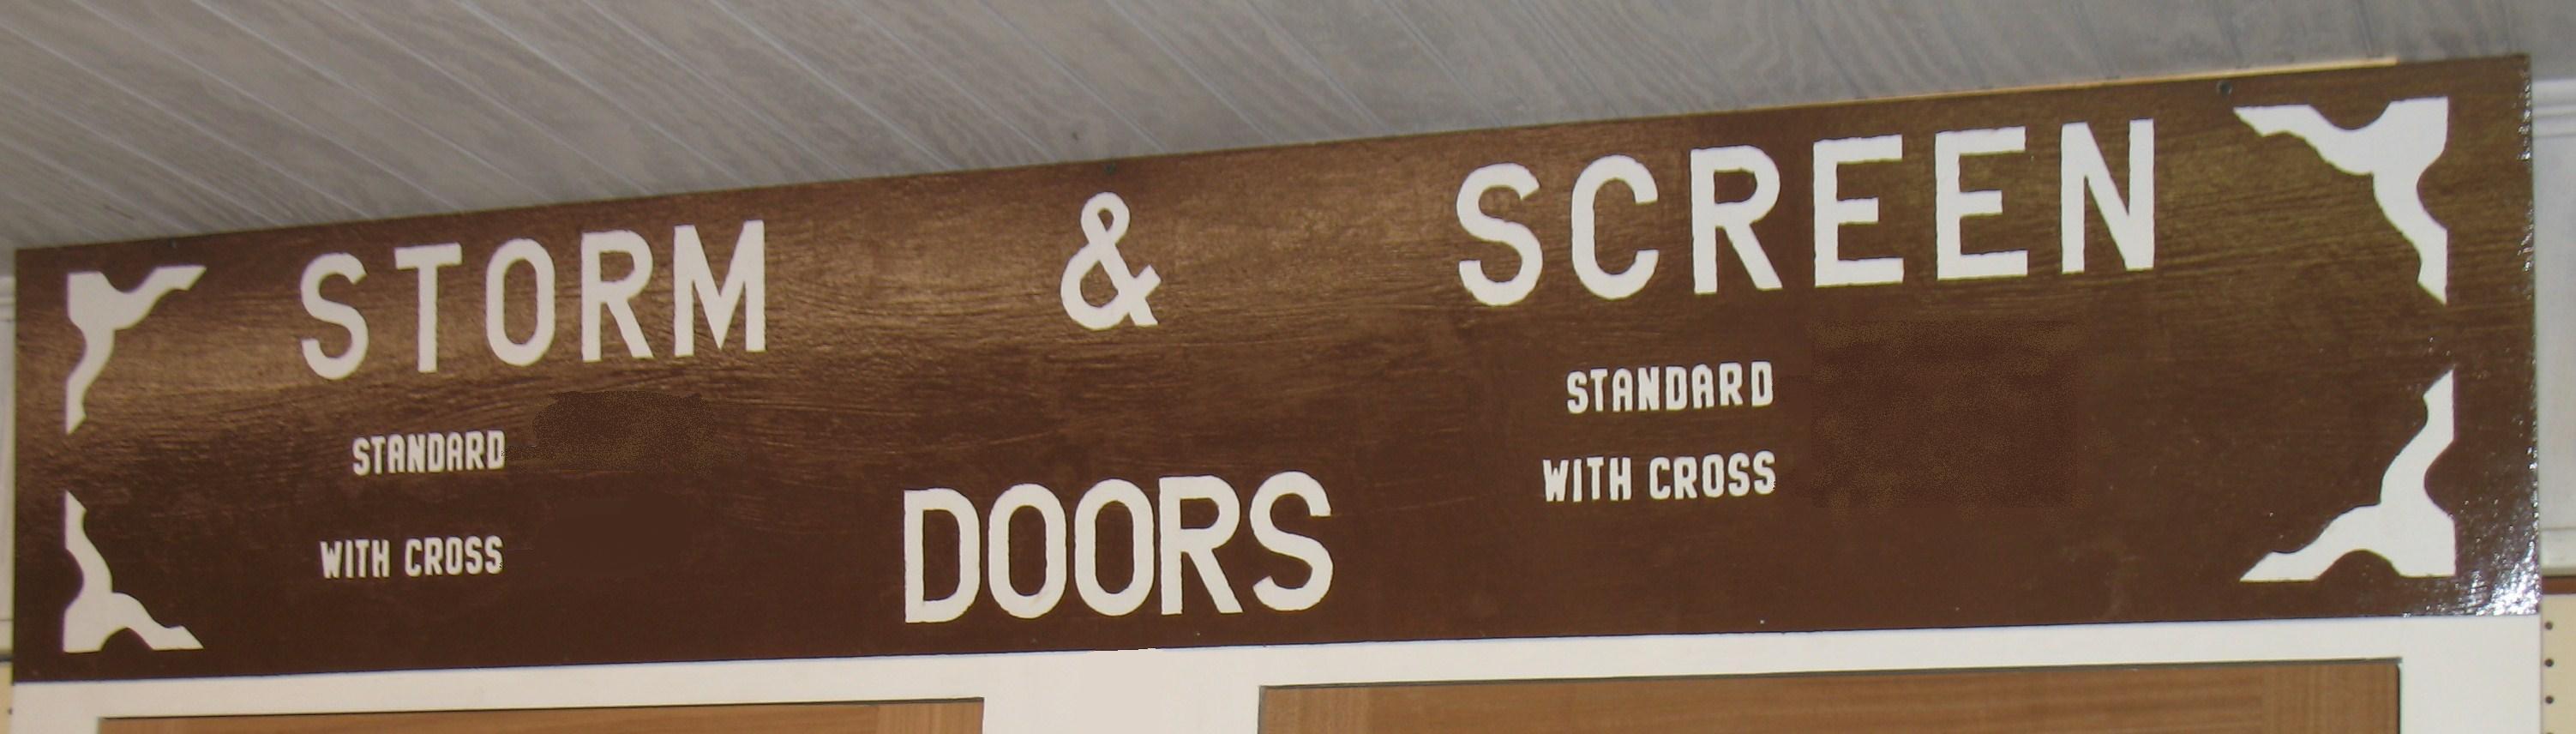 Cape May Lumber Storm Screen Doors